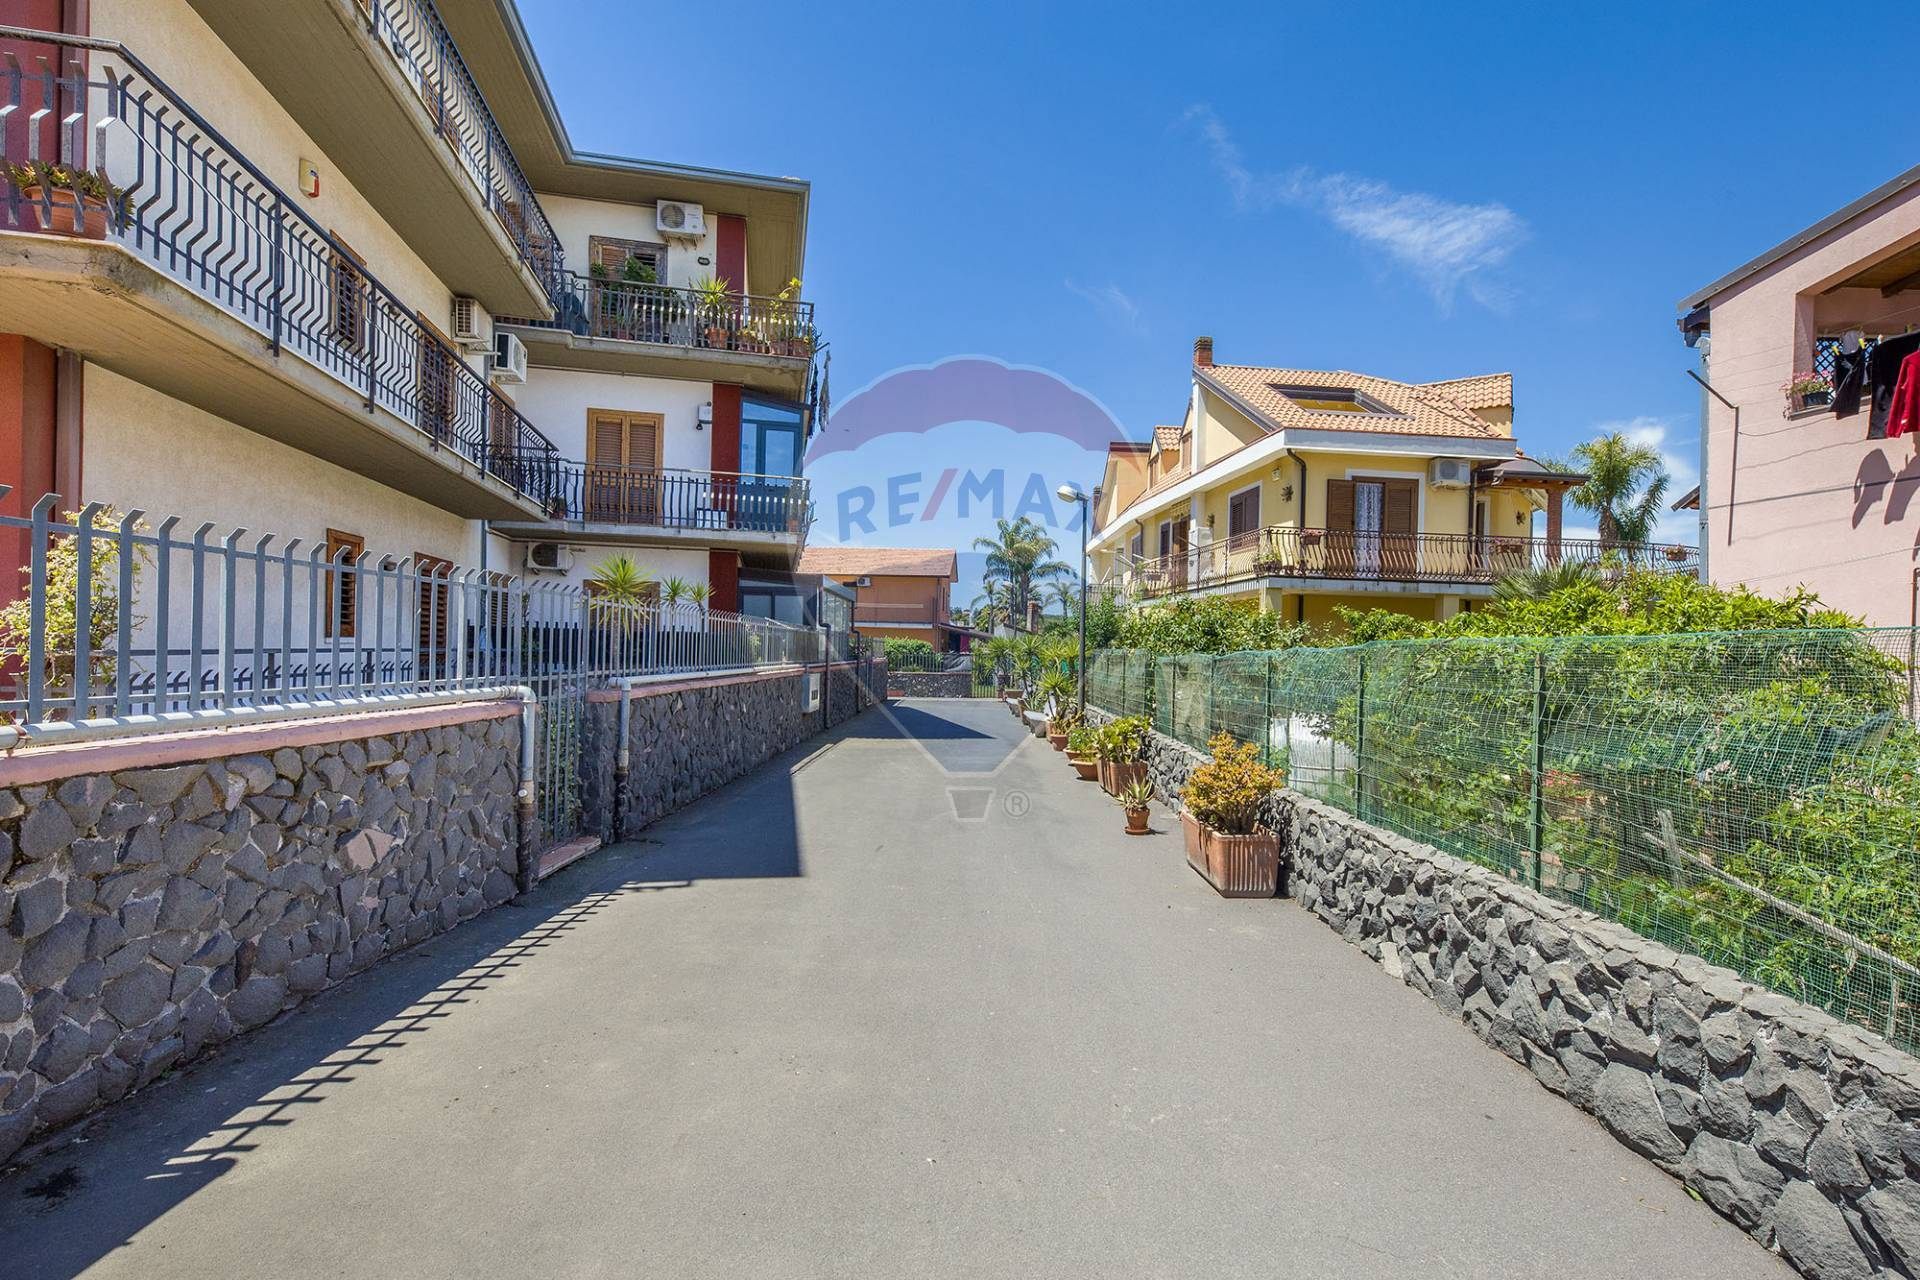 tremestieri etneo vendita quart:  re/max city home